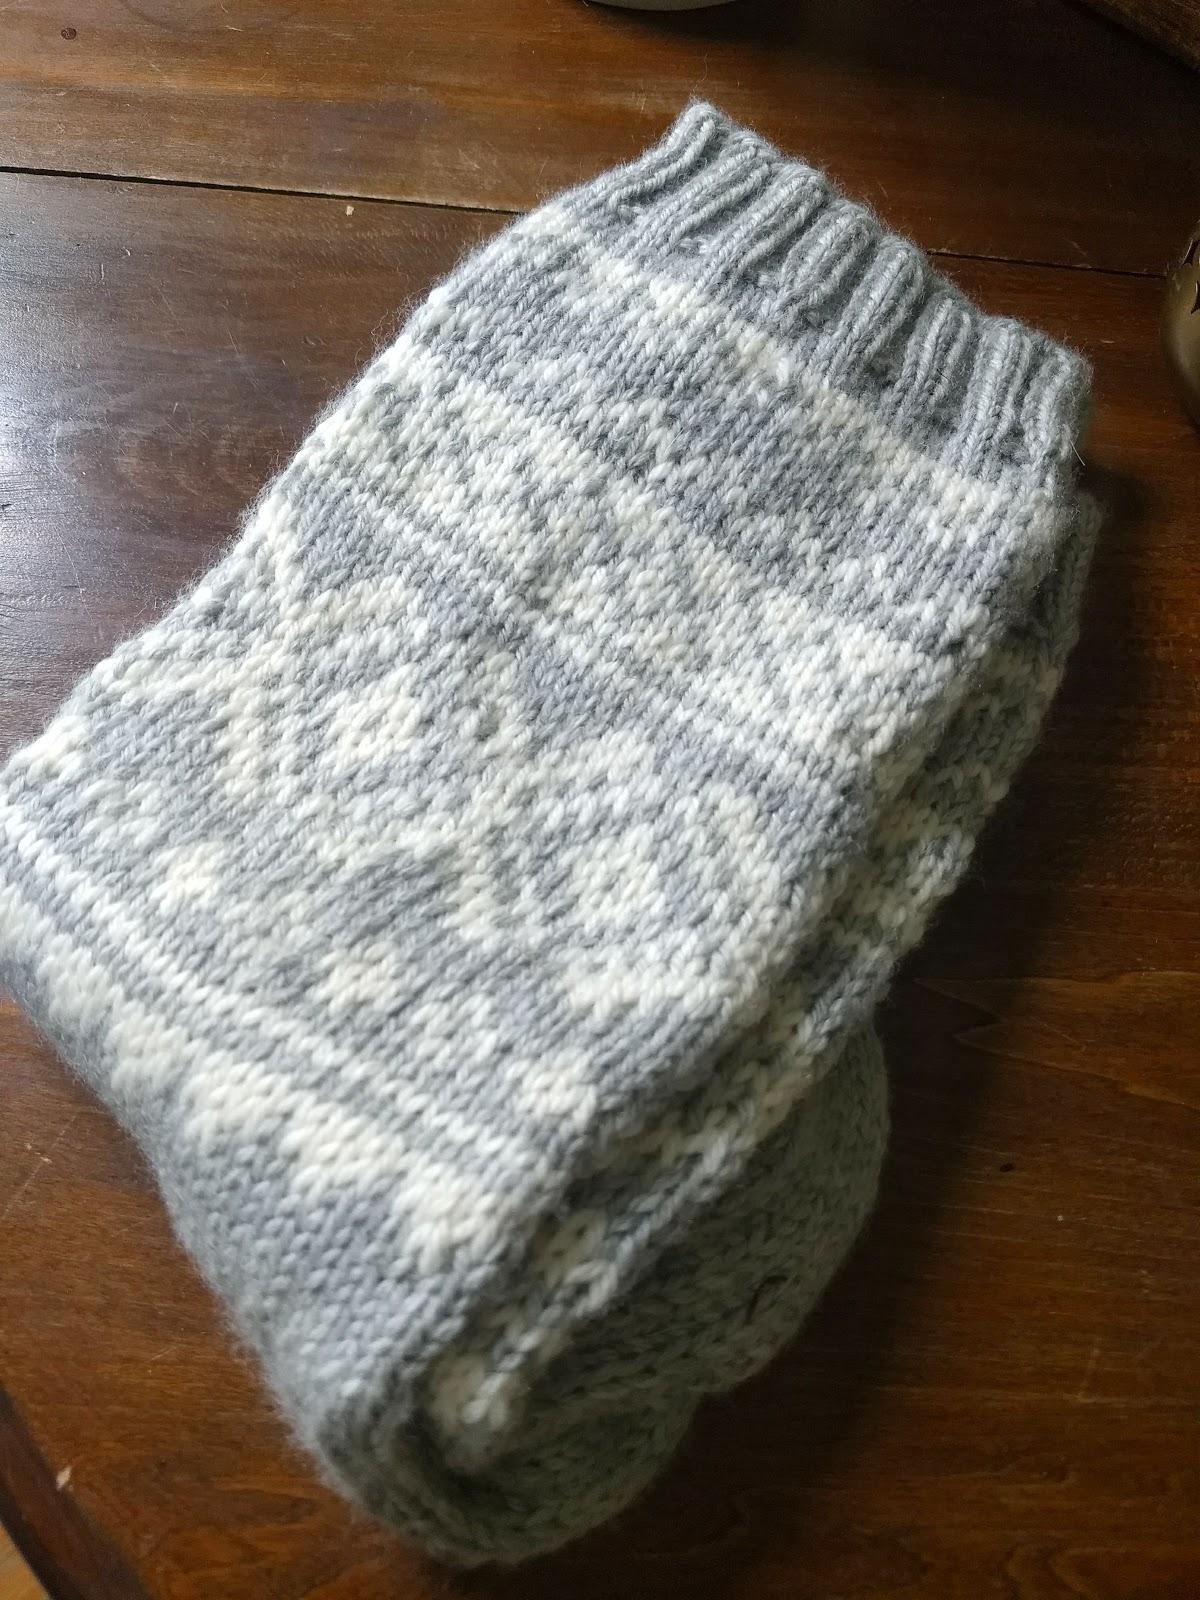 7b7b592590fac3 Rainy Day Socks | Cozy Things | Bloglovin'